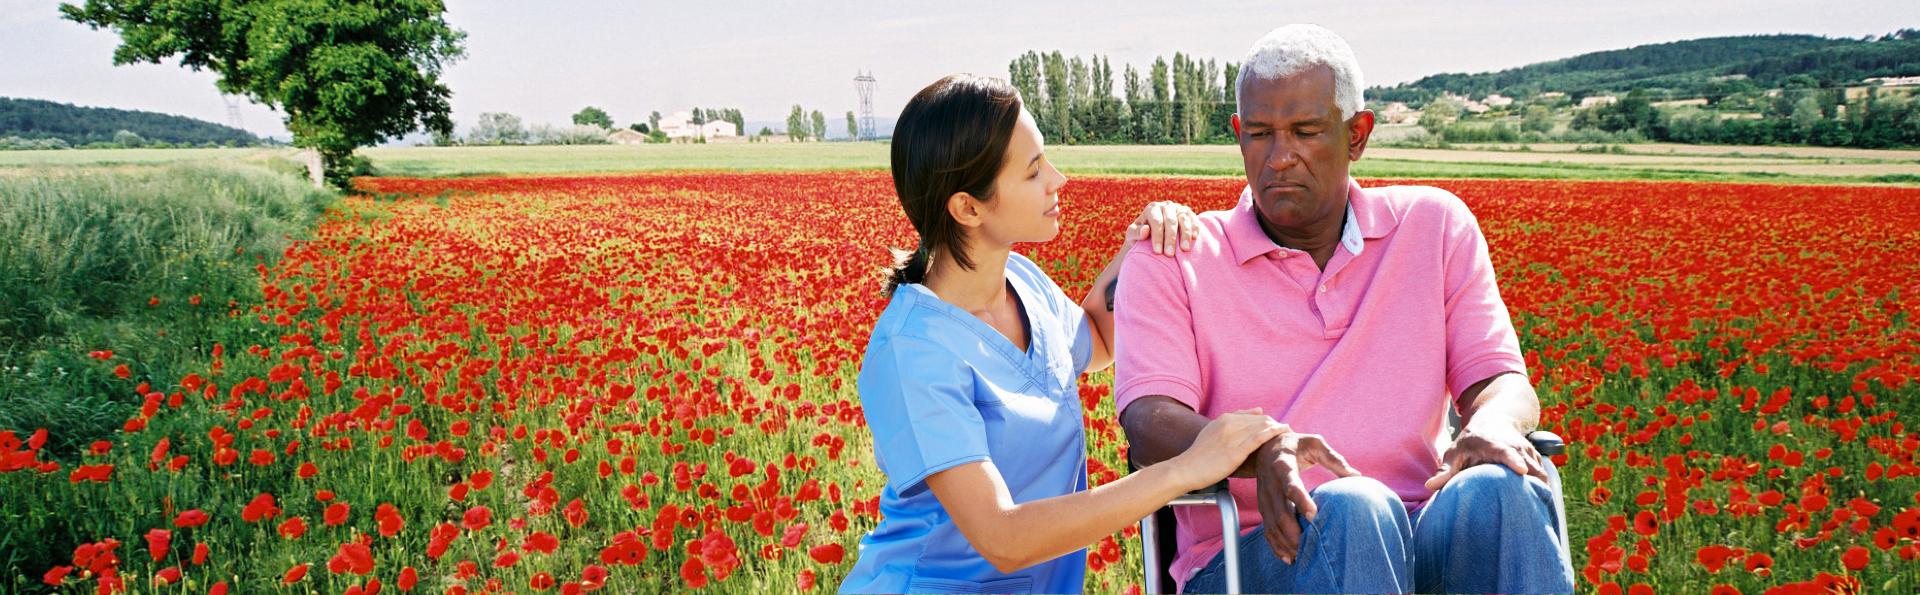 caregiver comforting senior man